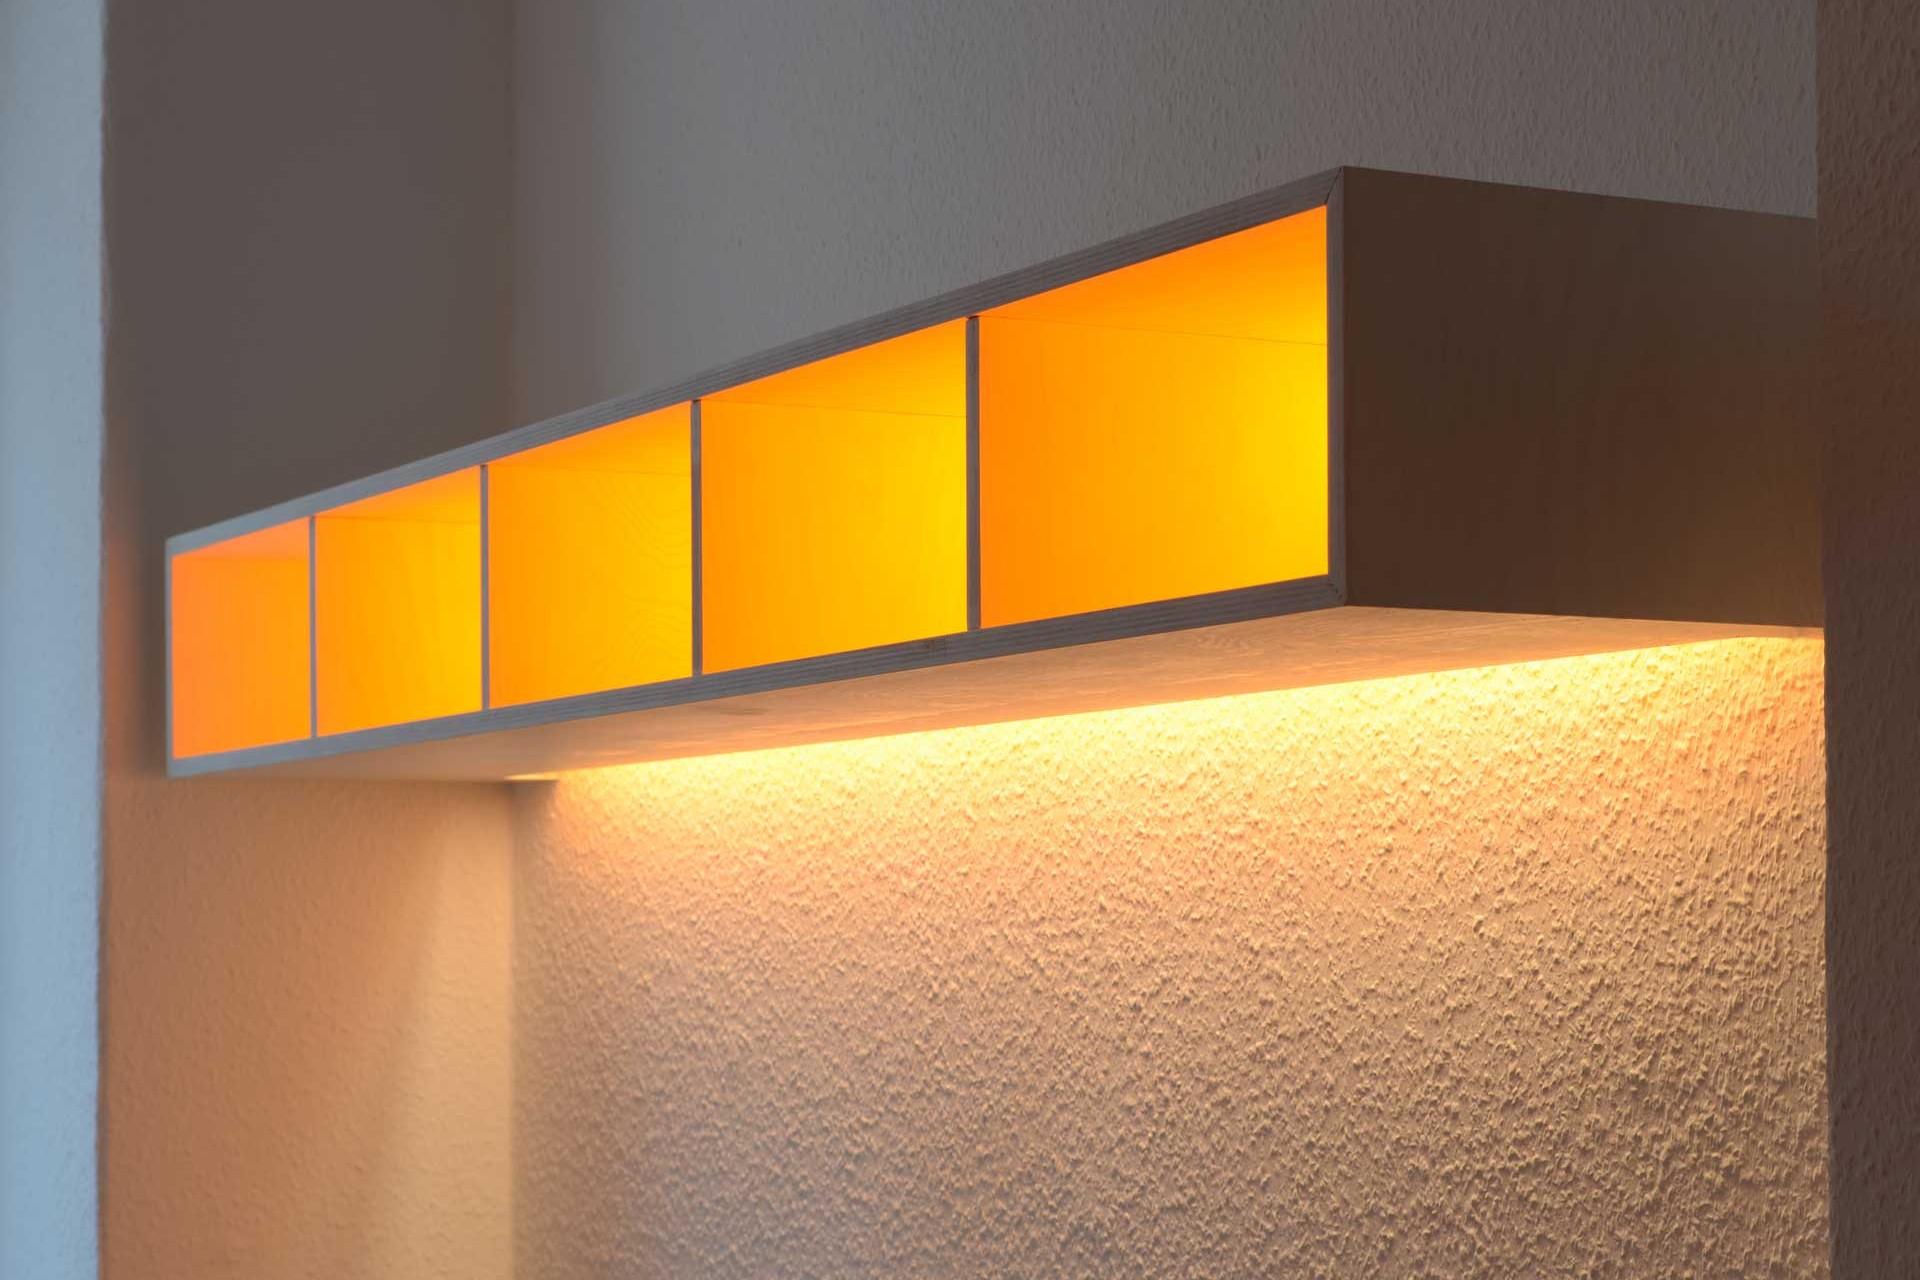 01-berlin-lpdm-thomas-wienands-architektur-innenarchitektur-moebeldesign-kuechenregal